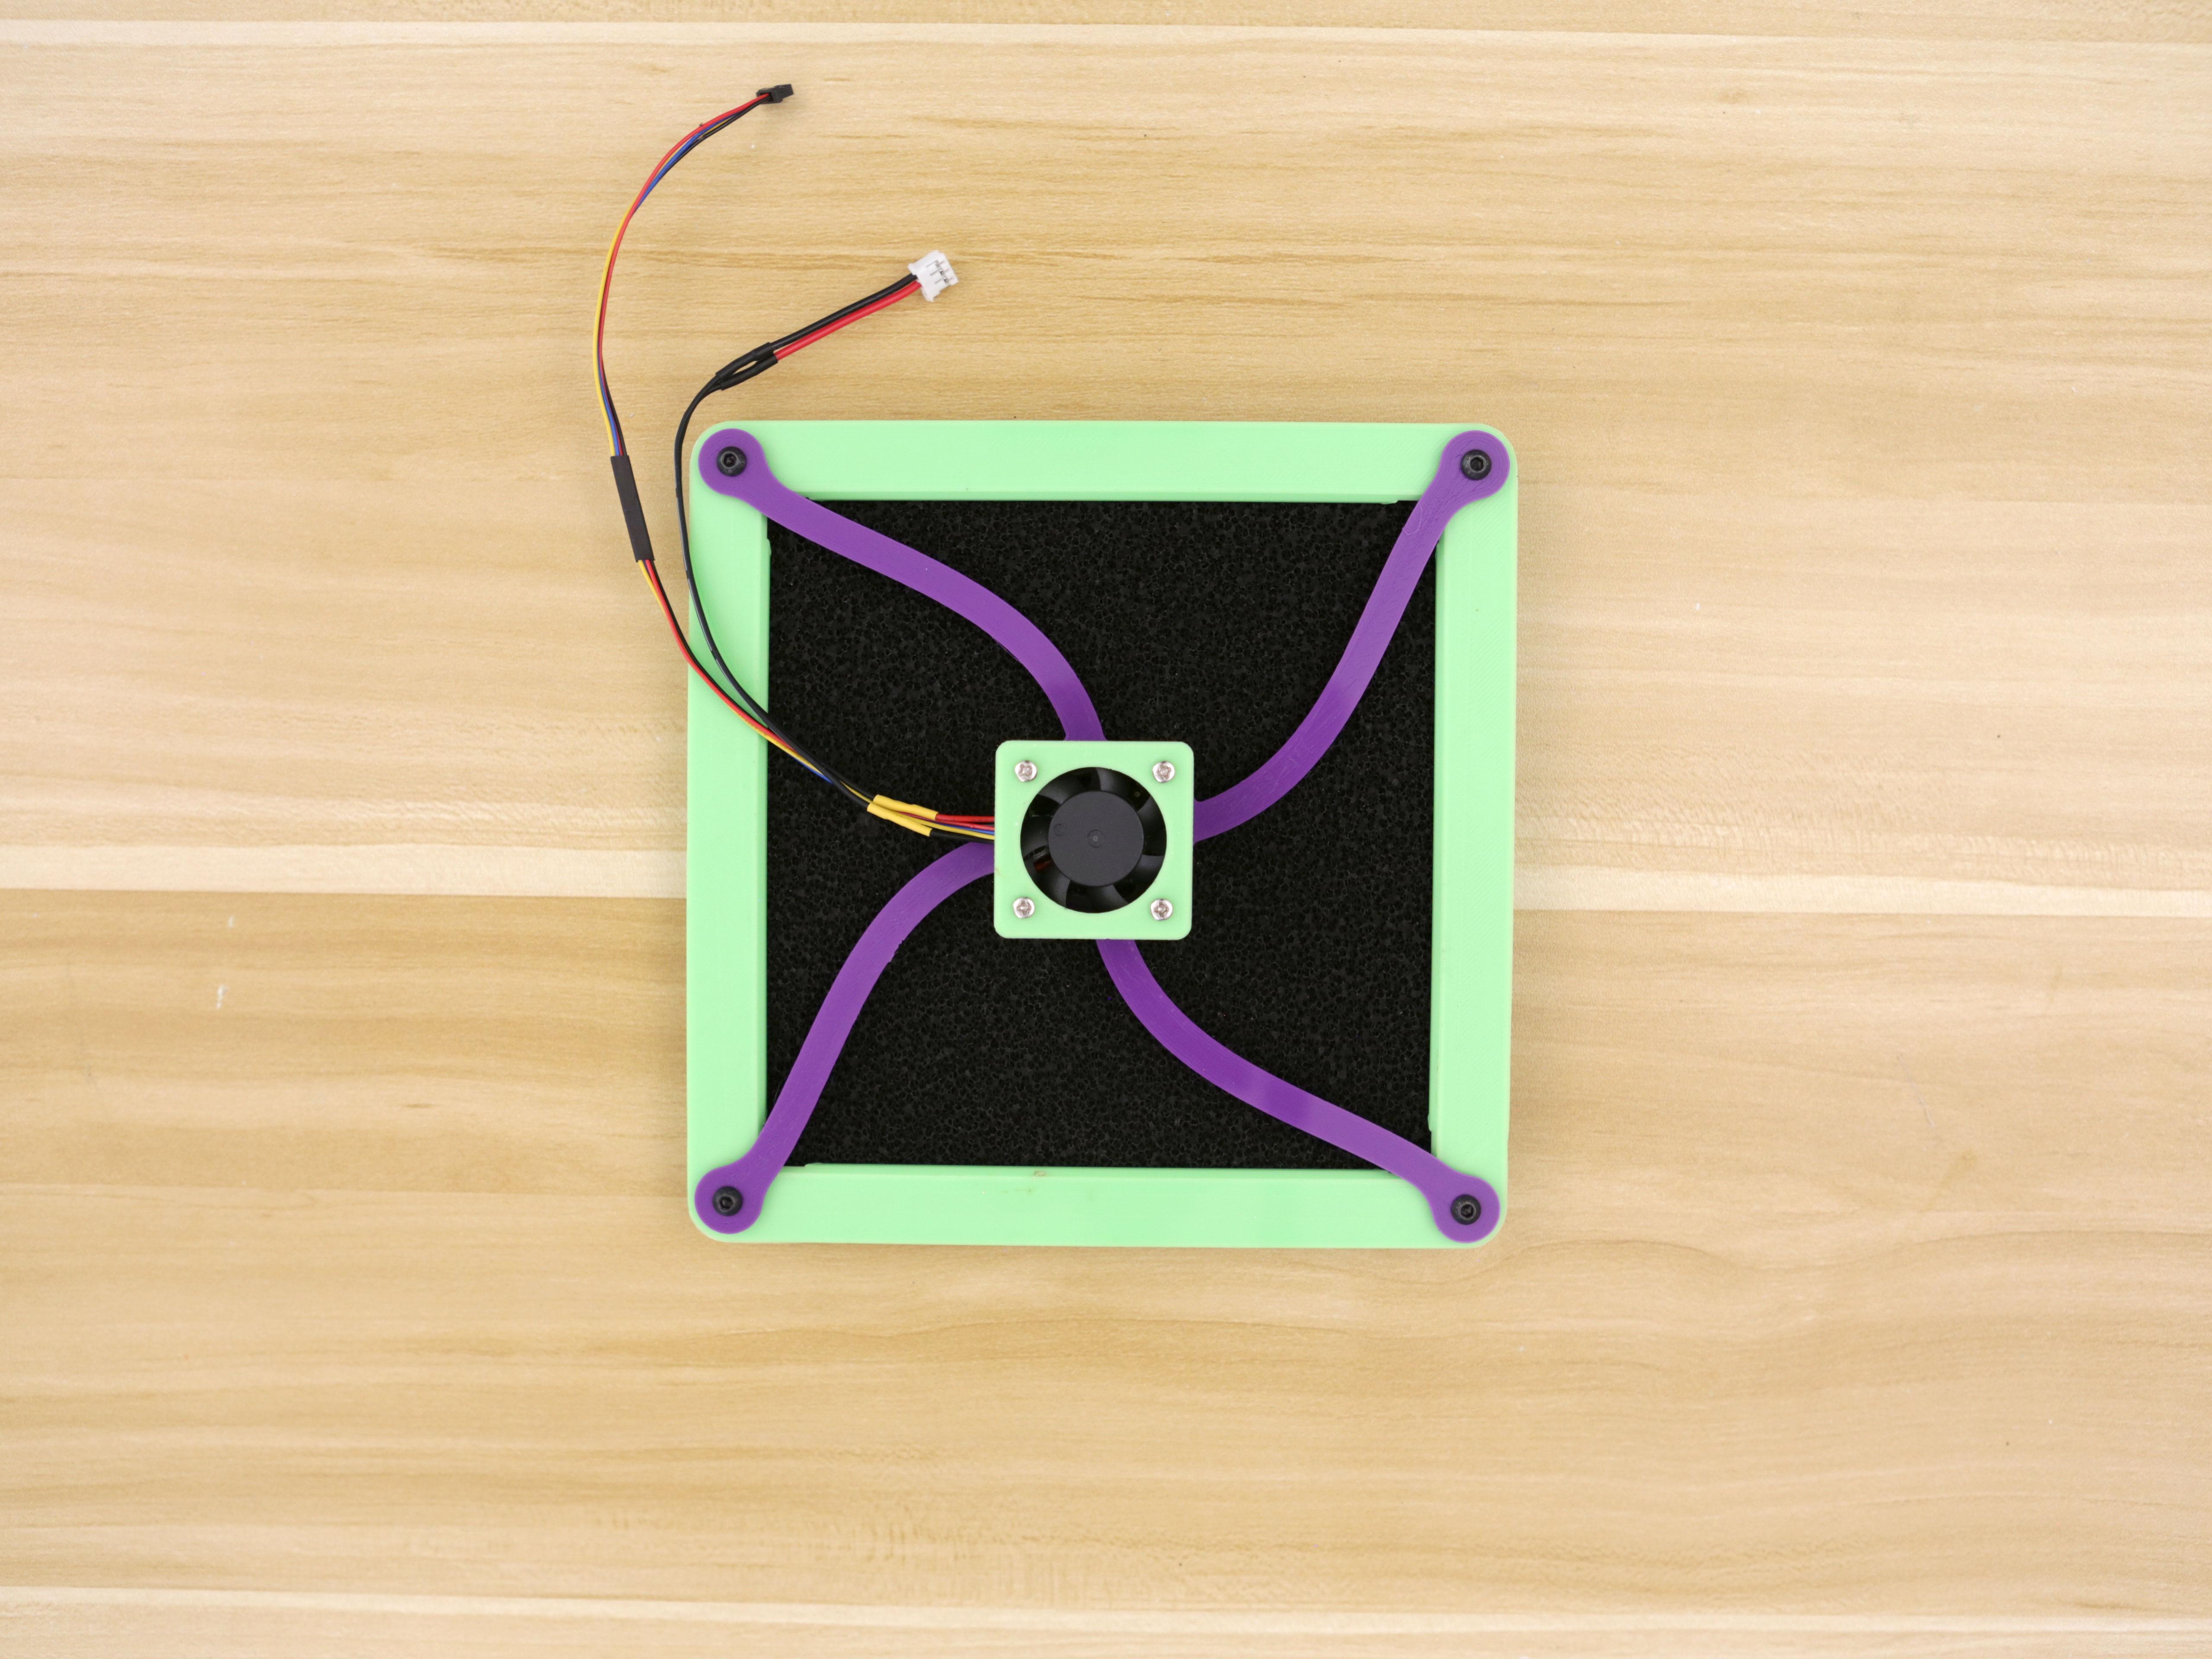 3d_printing_frontcover-sensor-mount-installed.jpg